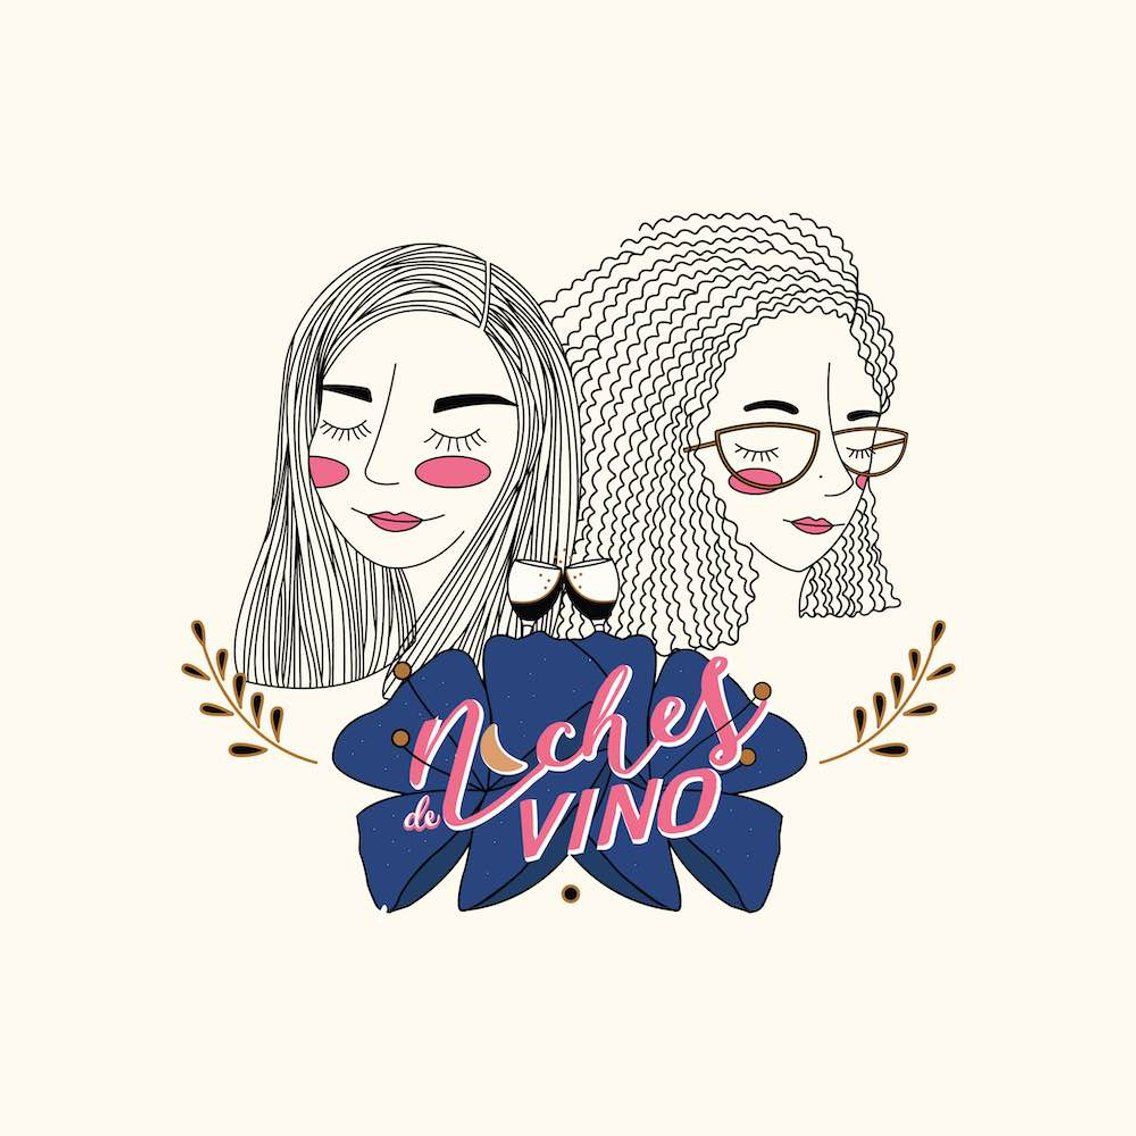 Noches de vino en podcast - Cover Image